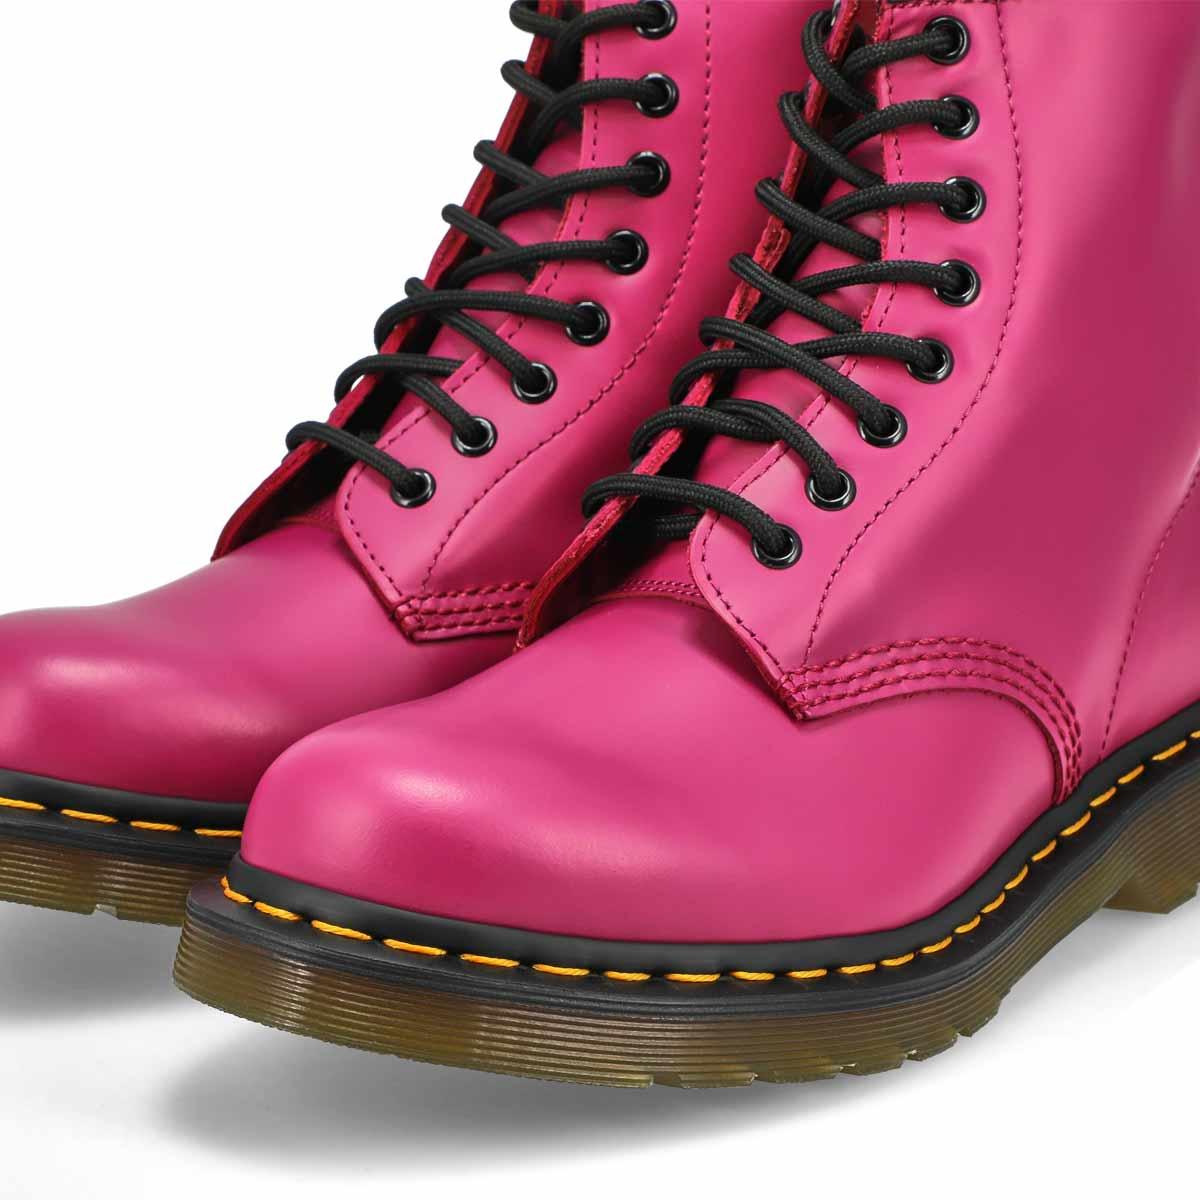 Women's 1460 8-Eye Boot - Fuchsia